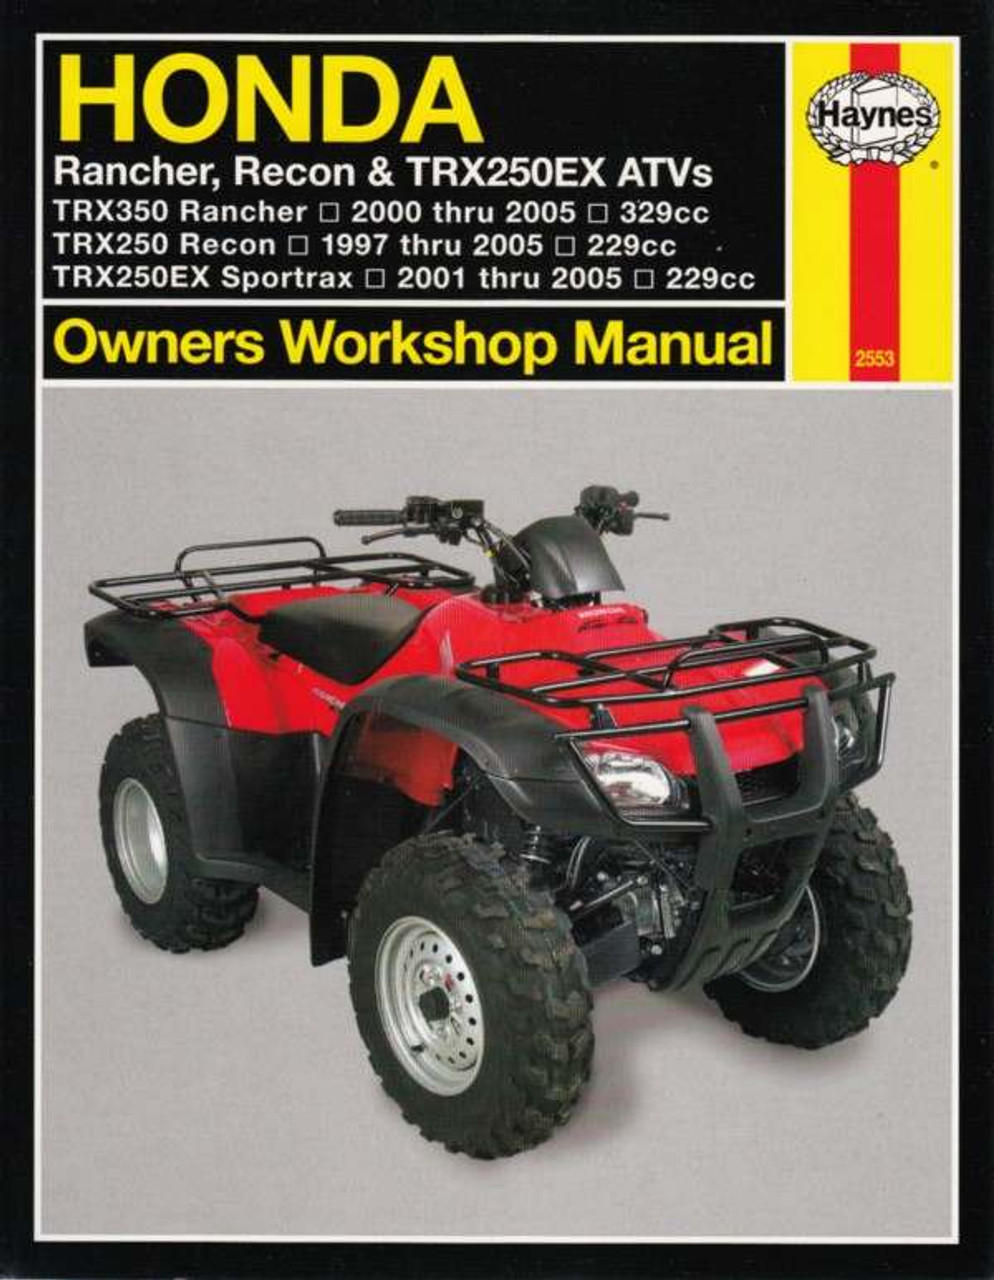 hight resolution of honda rancher recon trx250ex atvs 1997 2005 workshop manual honda trx350 rancher trx250